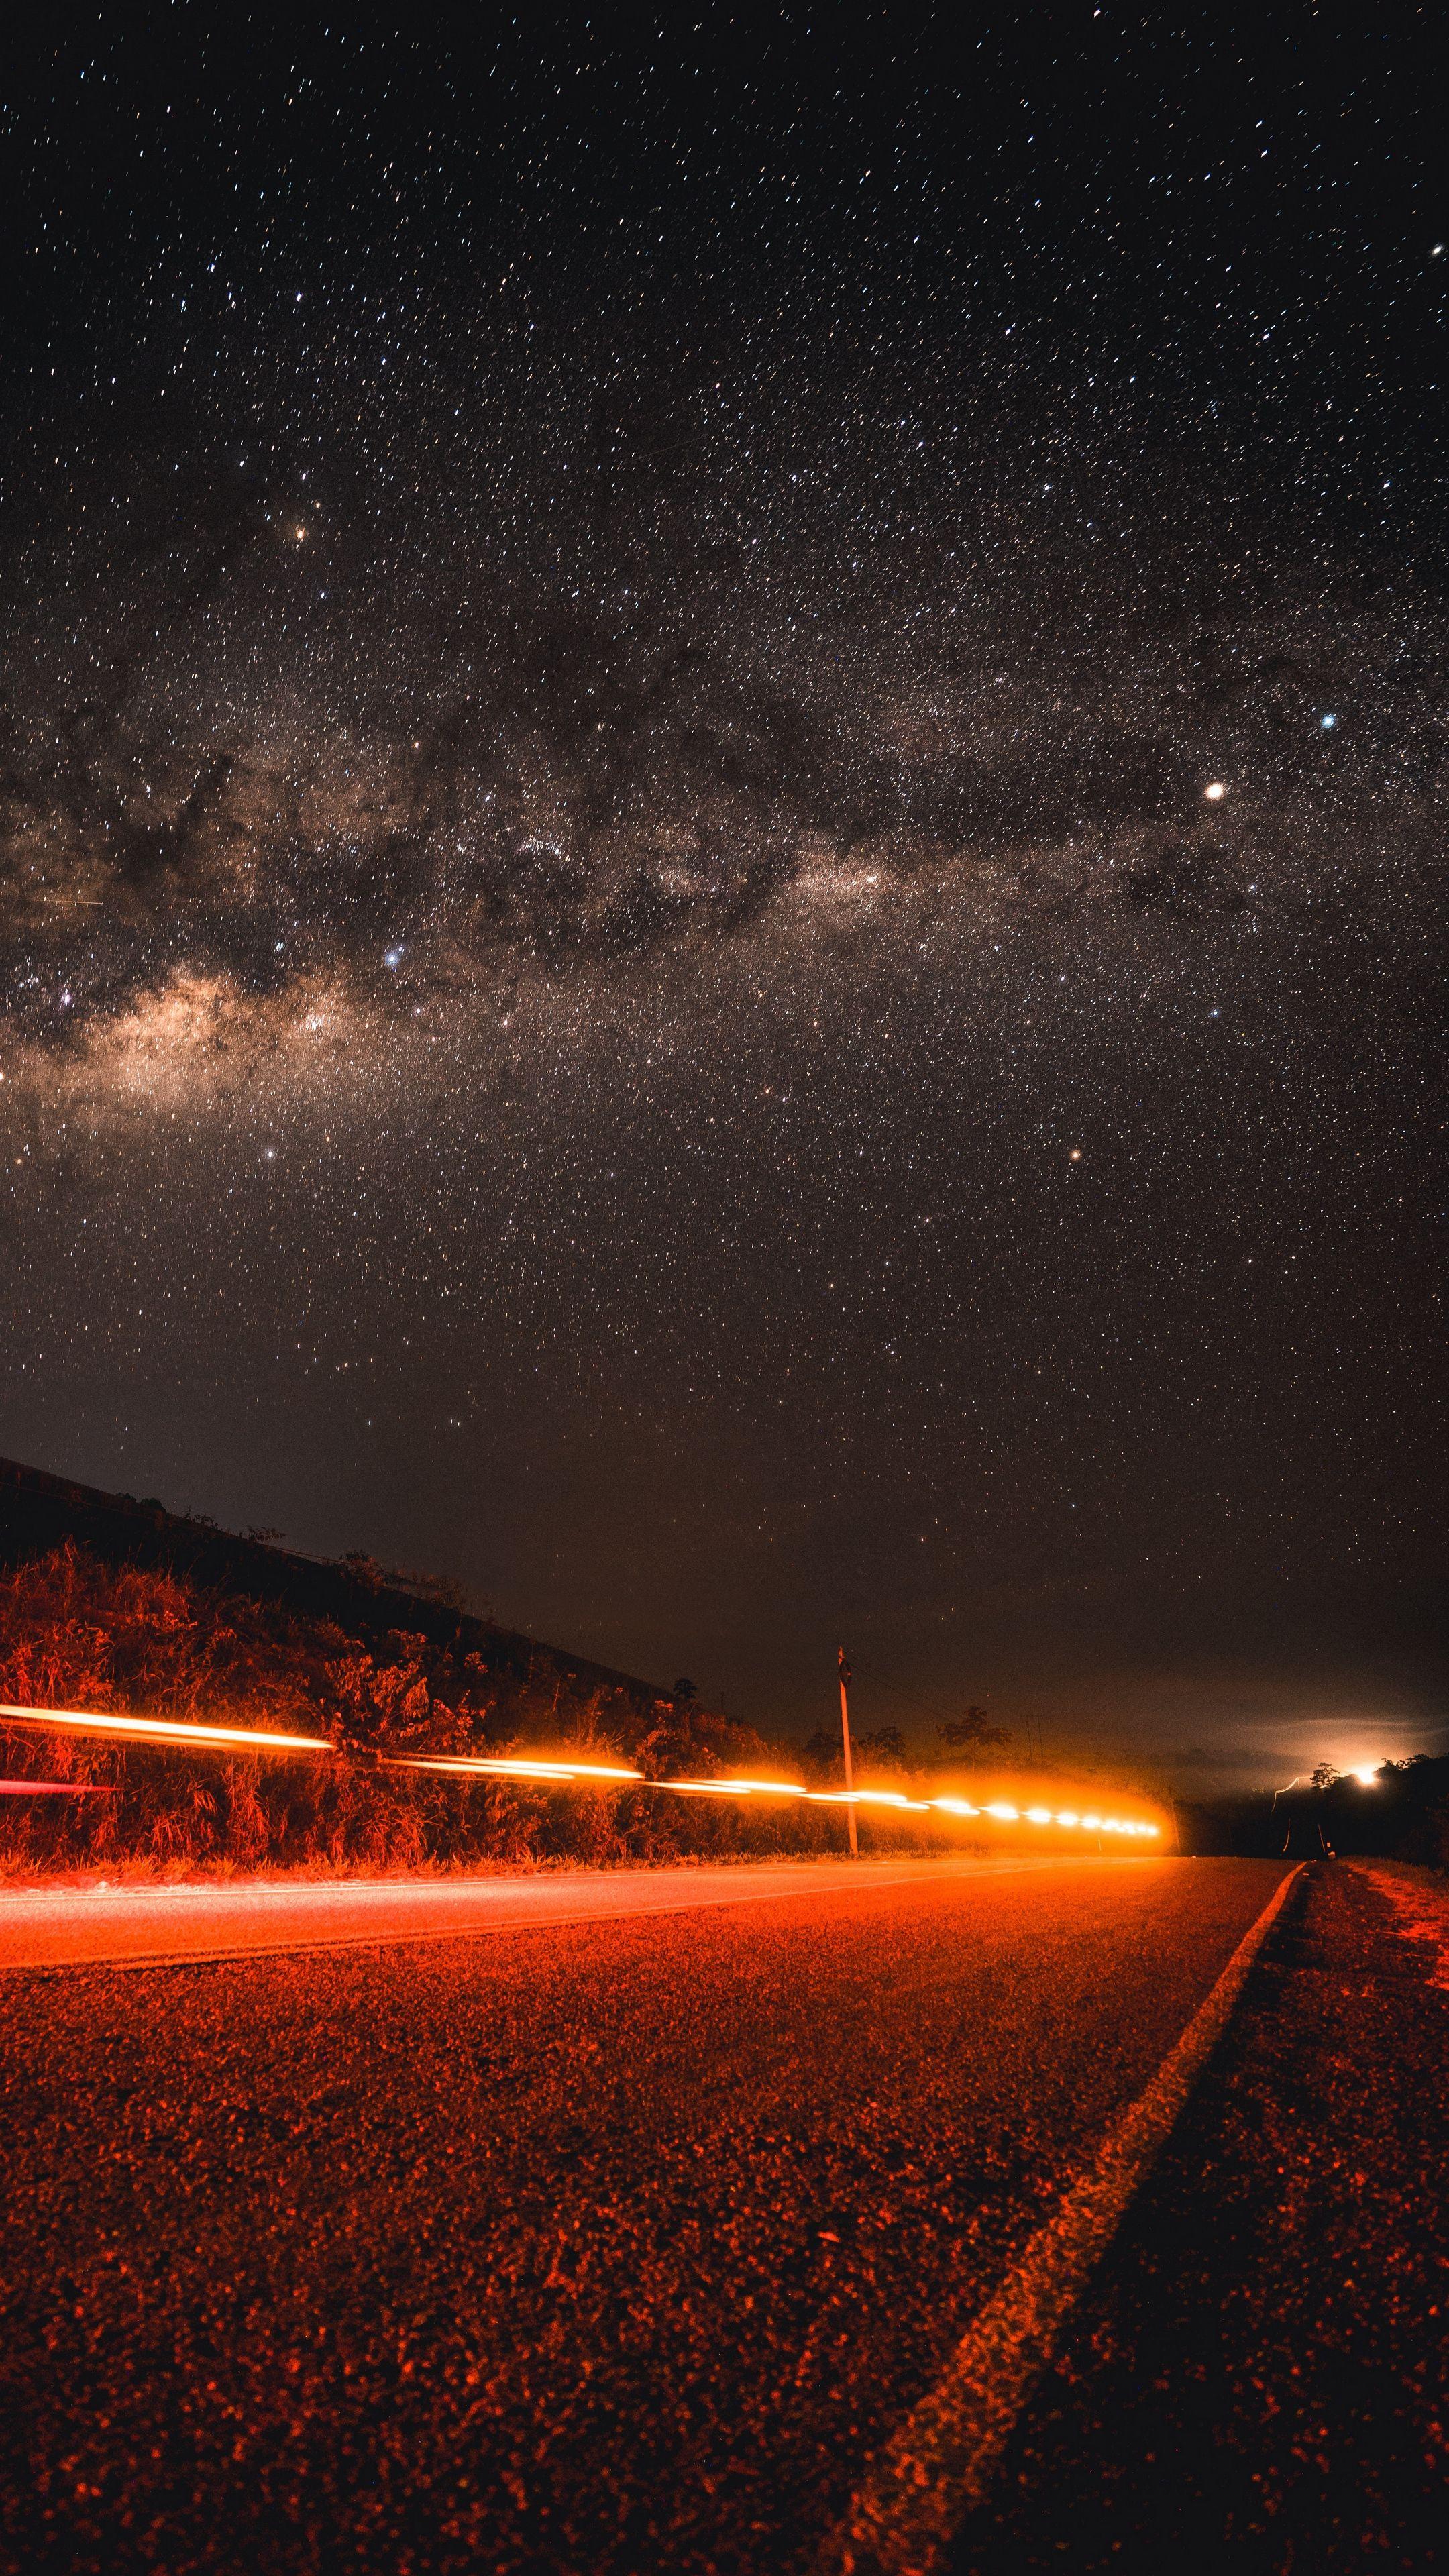 Sky road starrysky night wallpapers hd 4k background